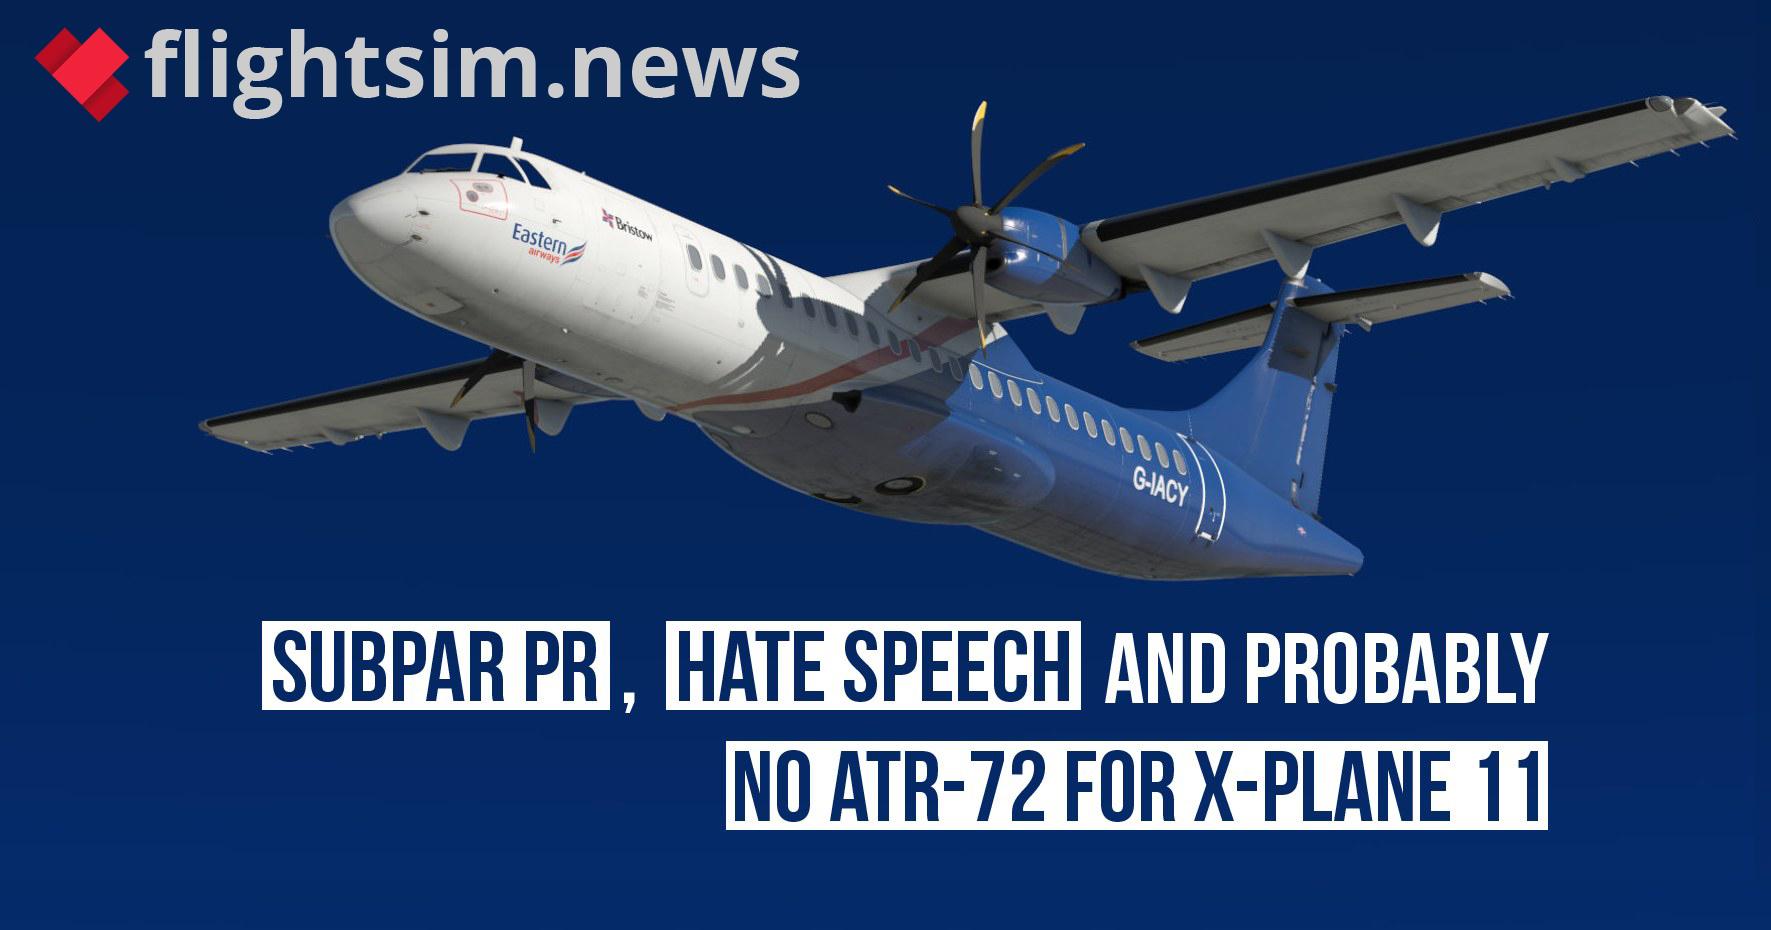 The Milviz XPlane / ATR Debacle: The Plot Thickens